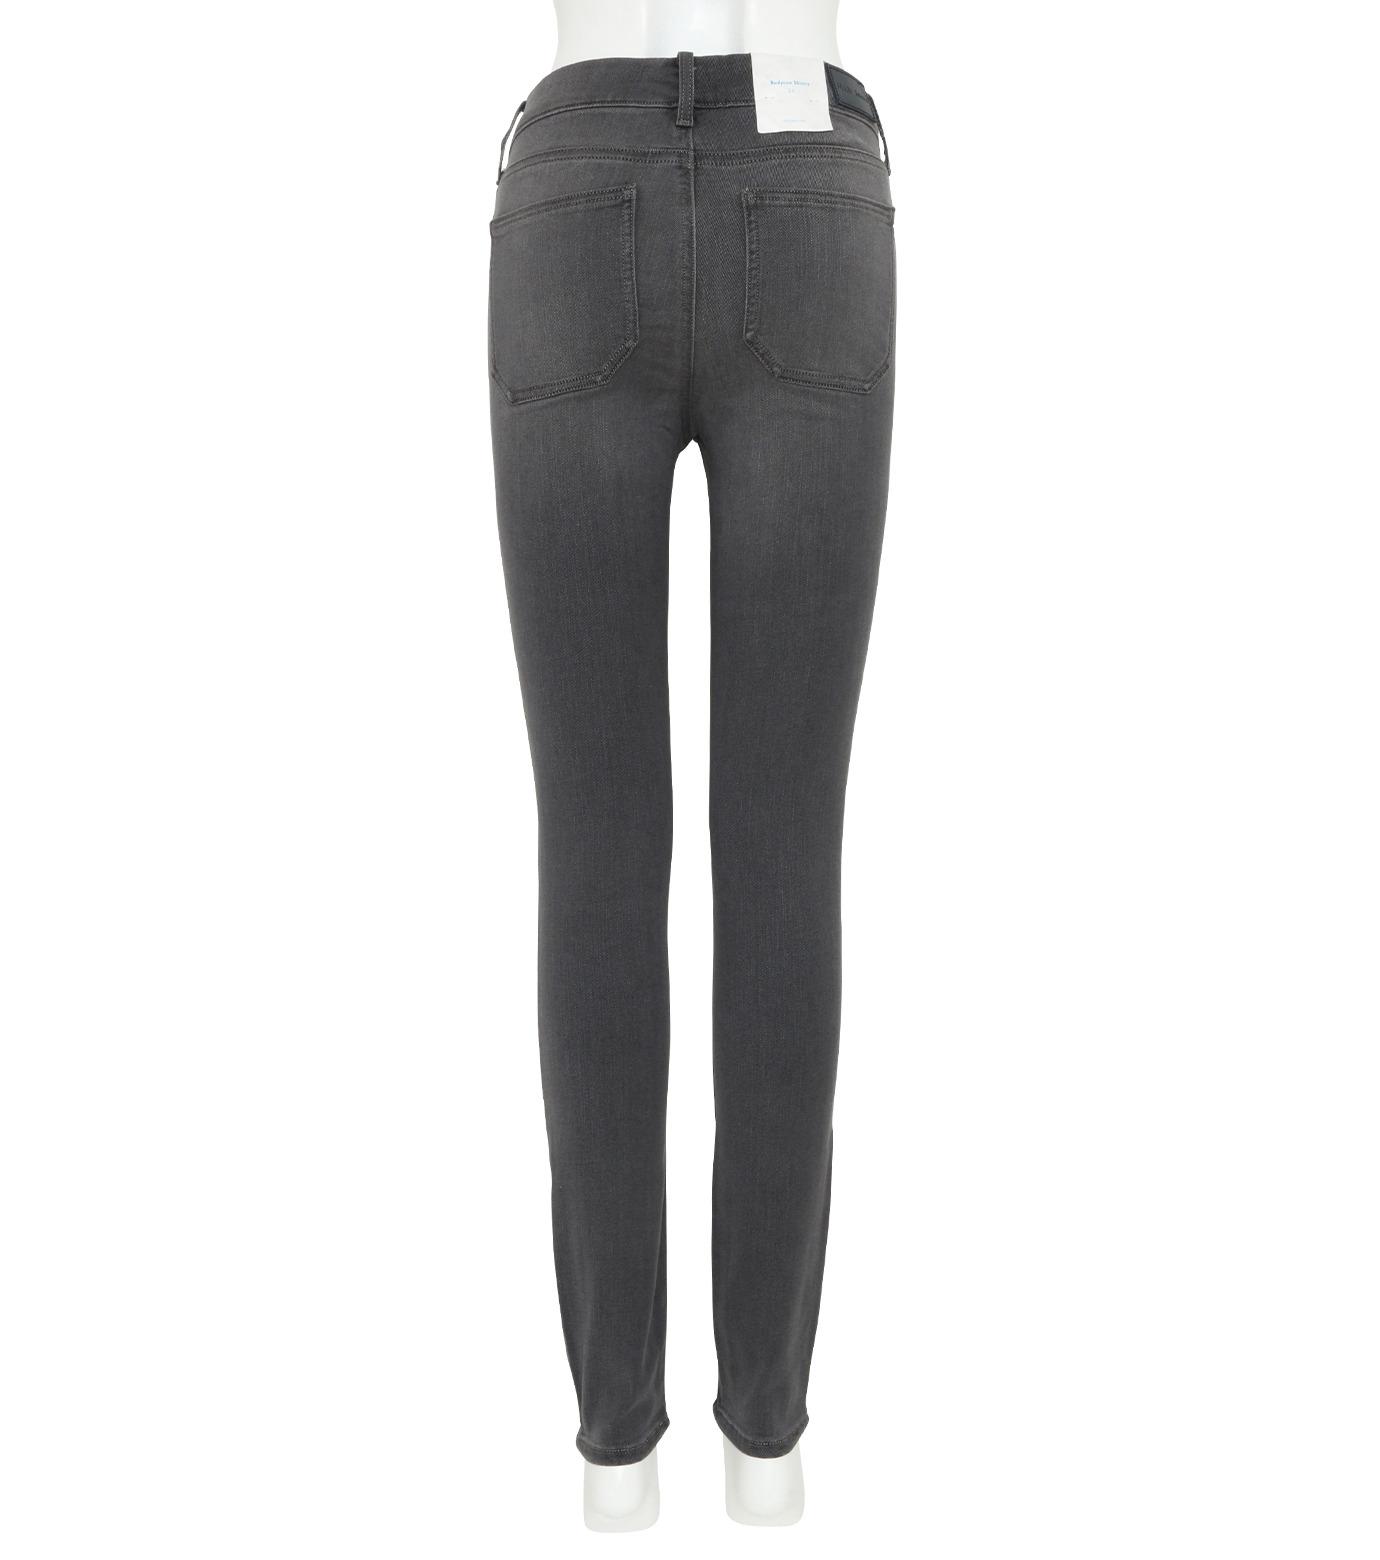 M.i.h Jeans(エムアイエイチジーンズ)のBodycon Skinny-GRAY(デニム/denim)-W2201106-11 拡大詳細画像2